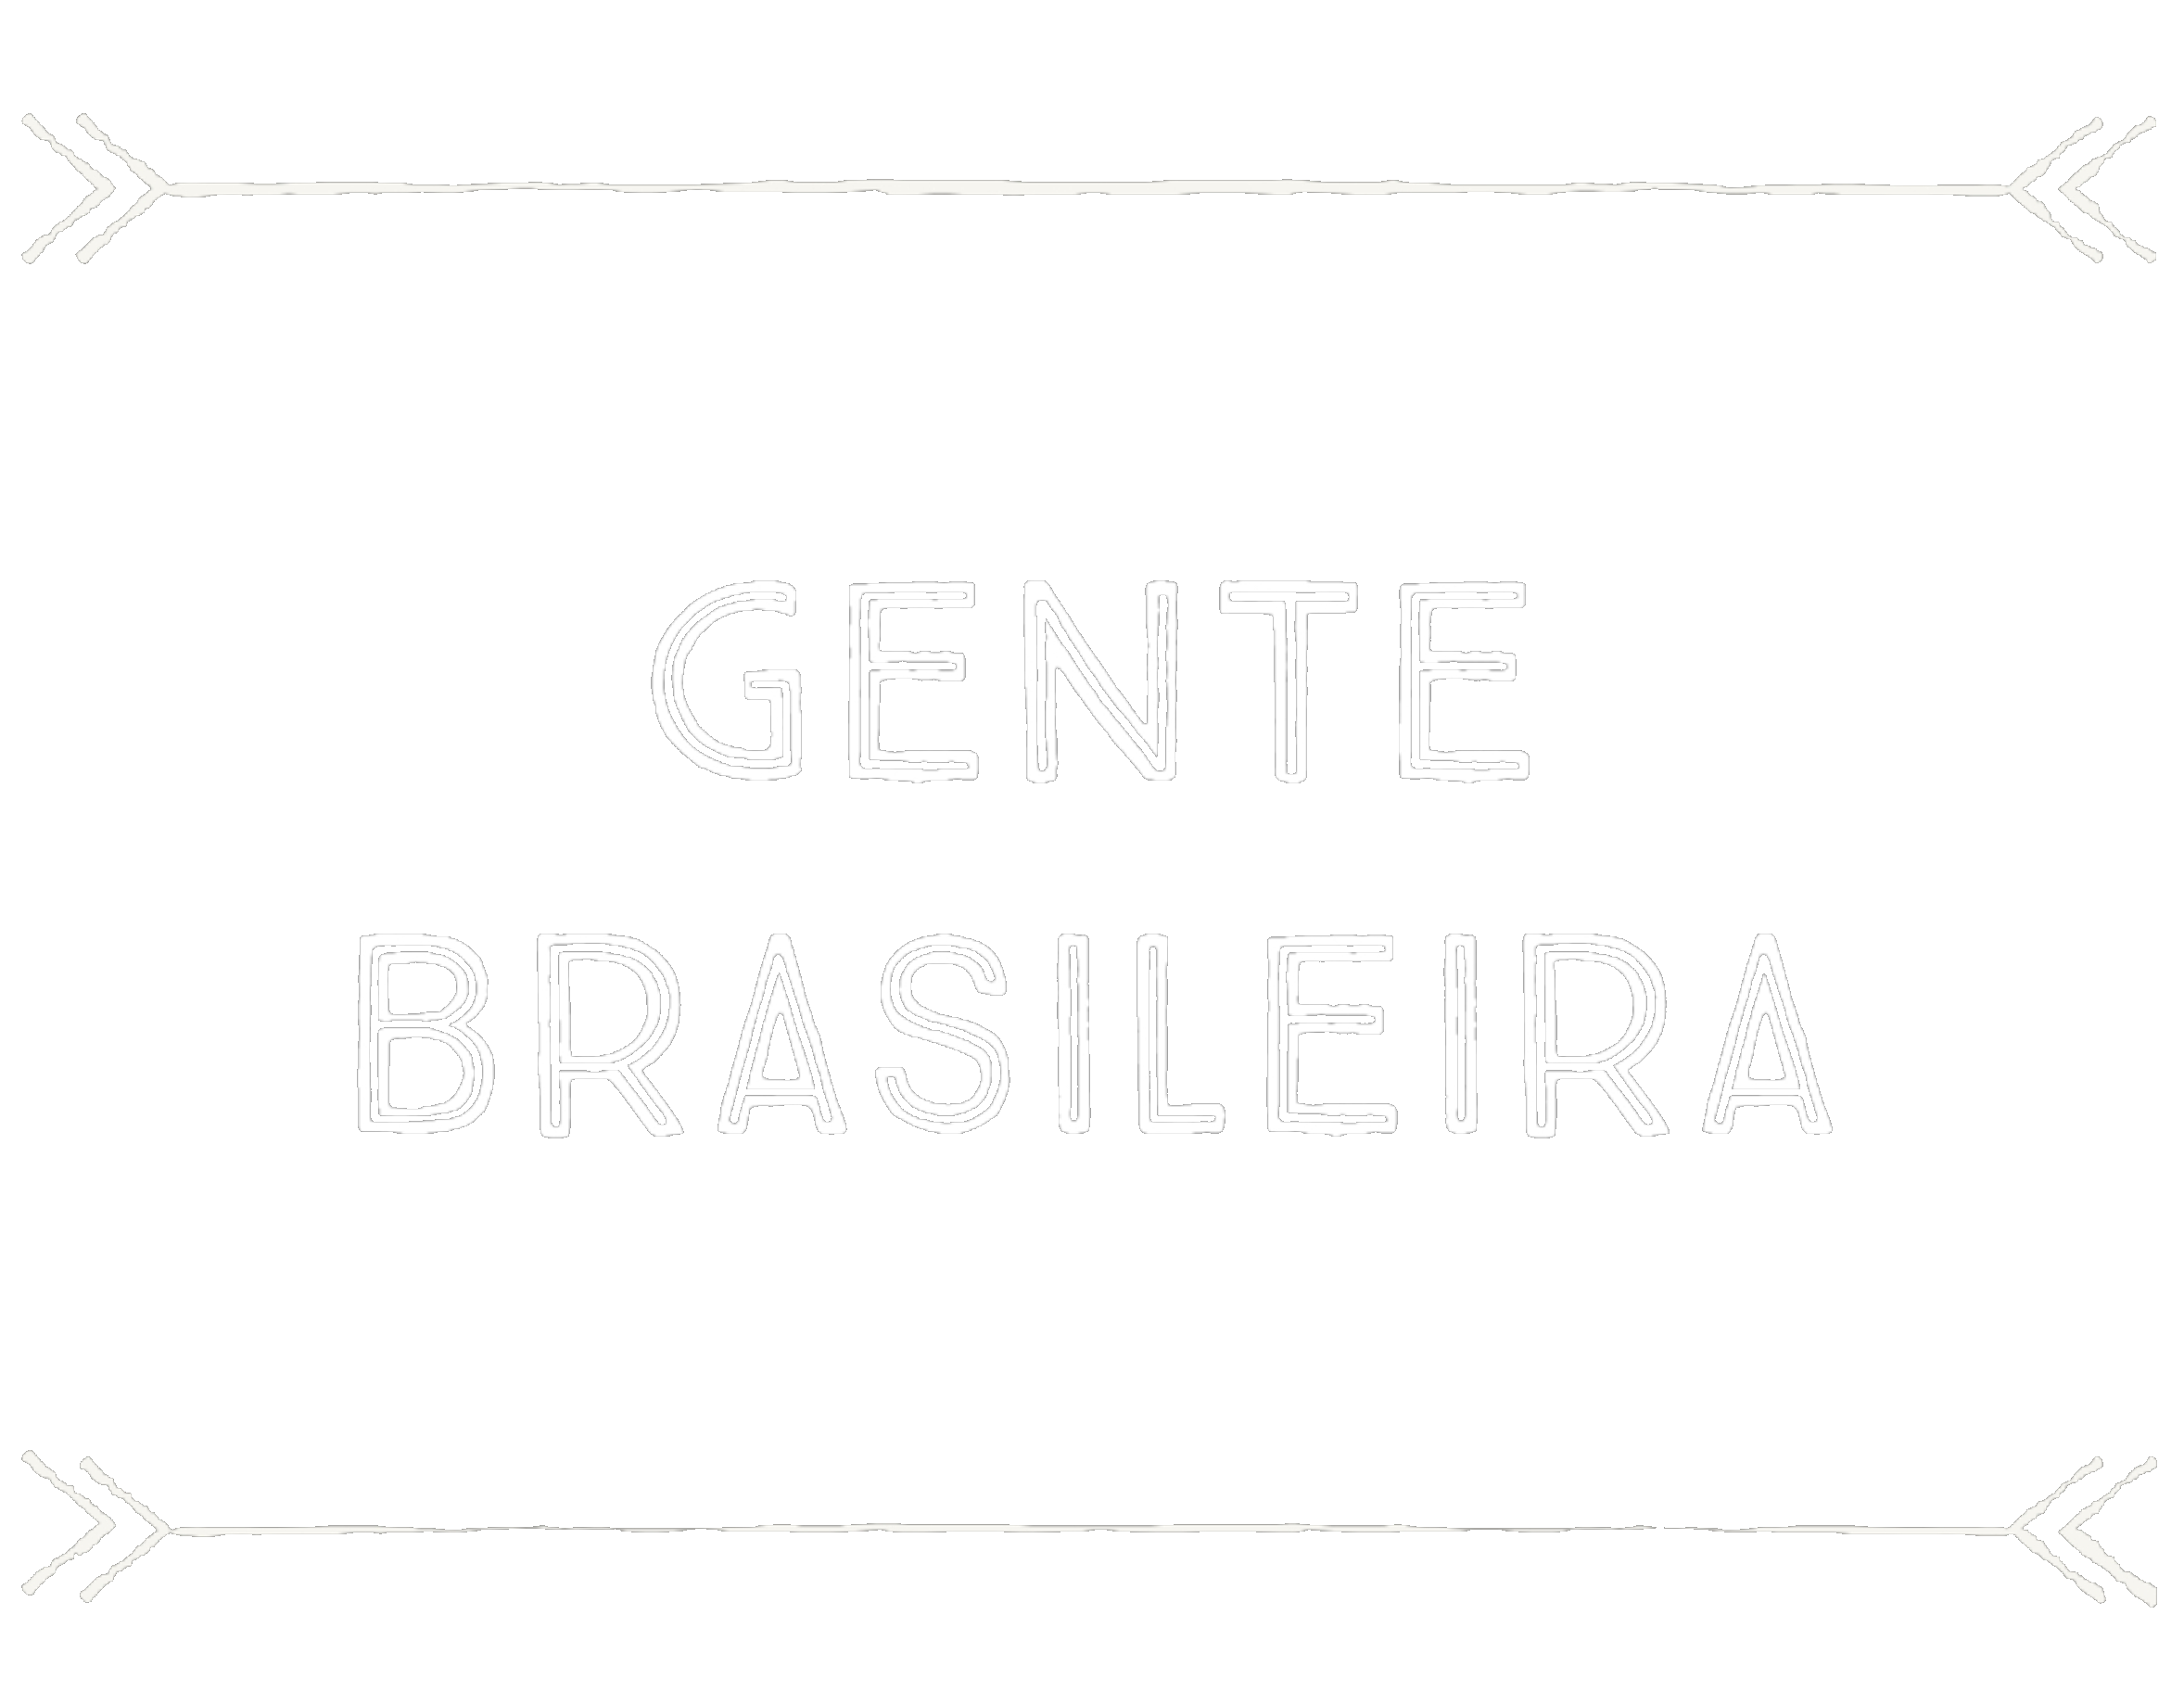 GenteBrasileira